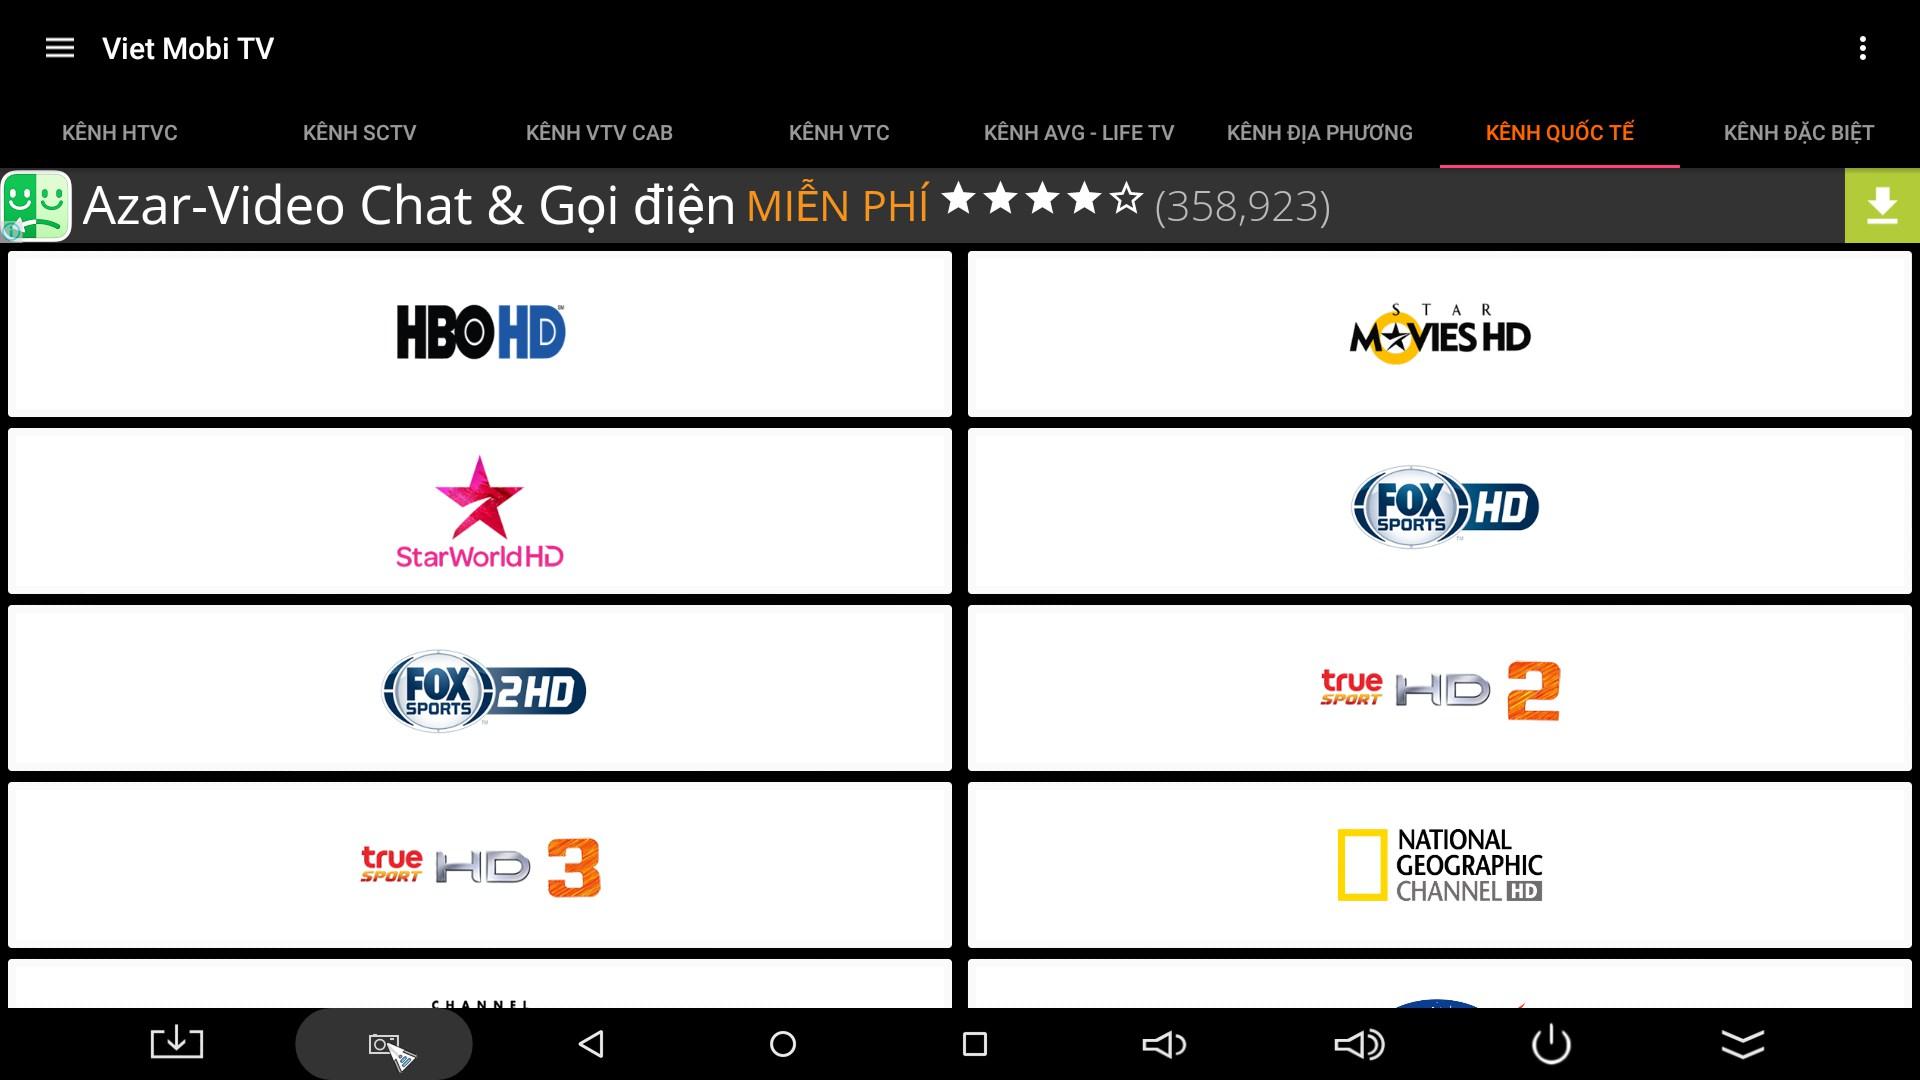 ung-dung-viet-mobi-tv-xem-k-va-truyen-hinh-mien-phi-tren-android-tv-box-3.jpg